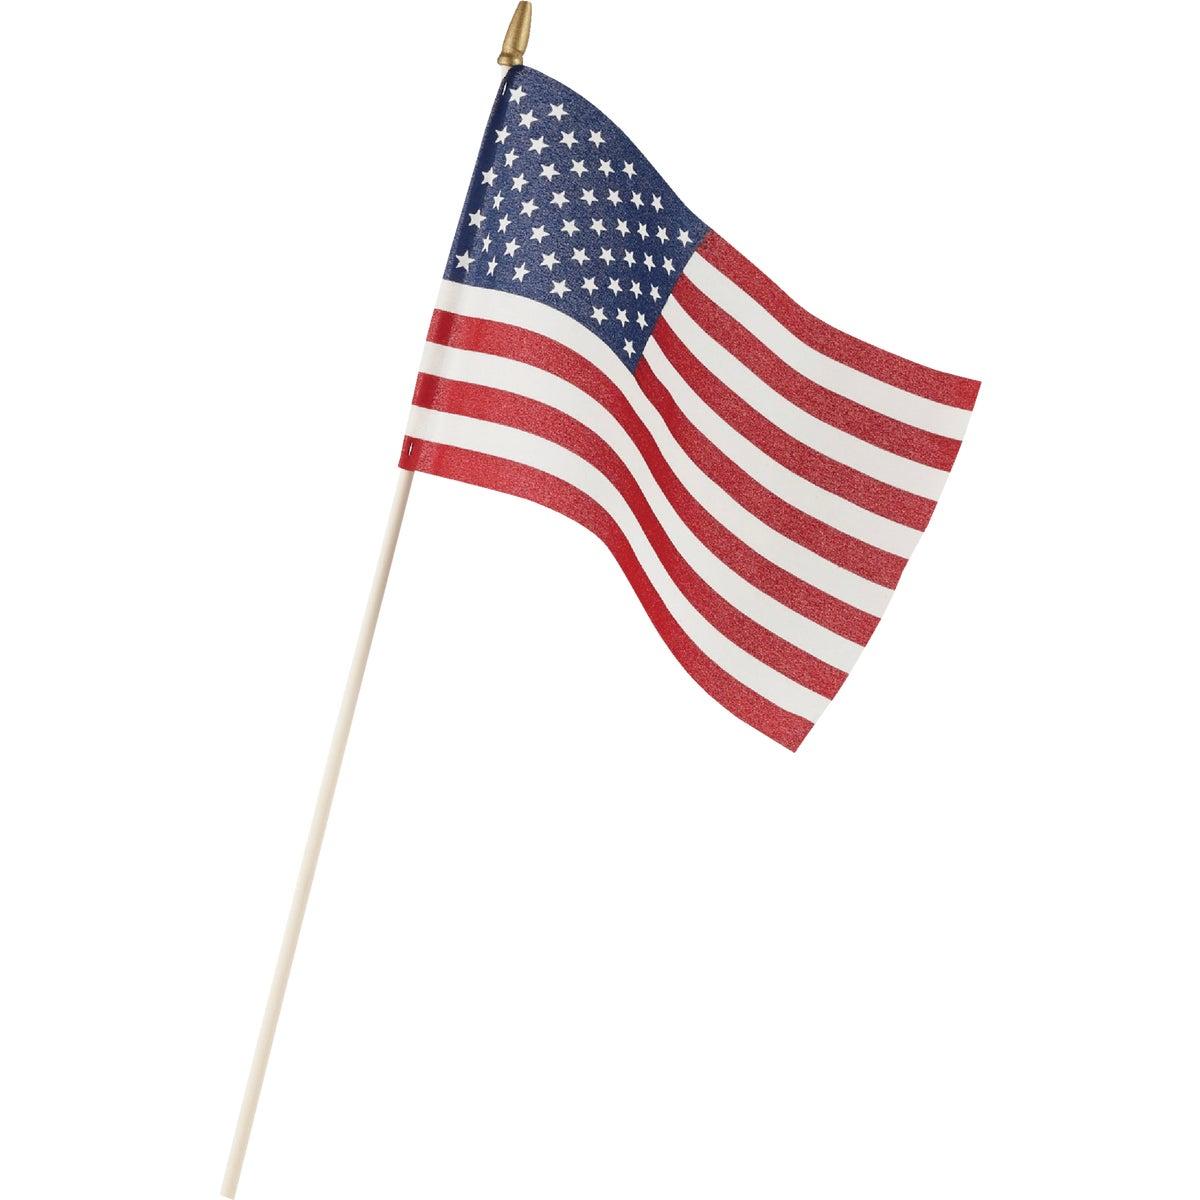 48PK 8X12 DISP CUP FLAG